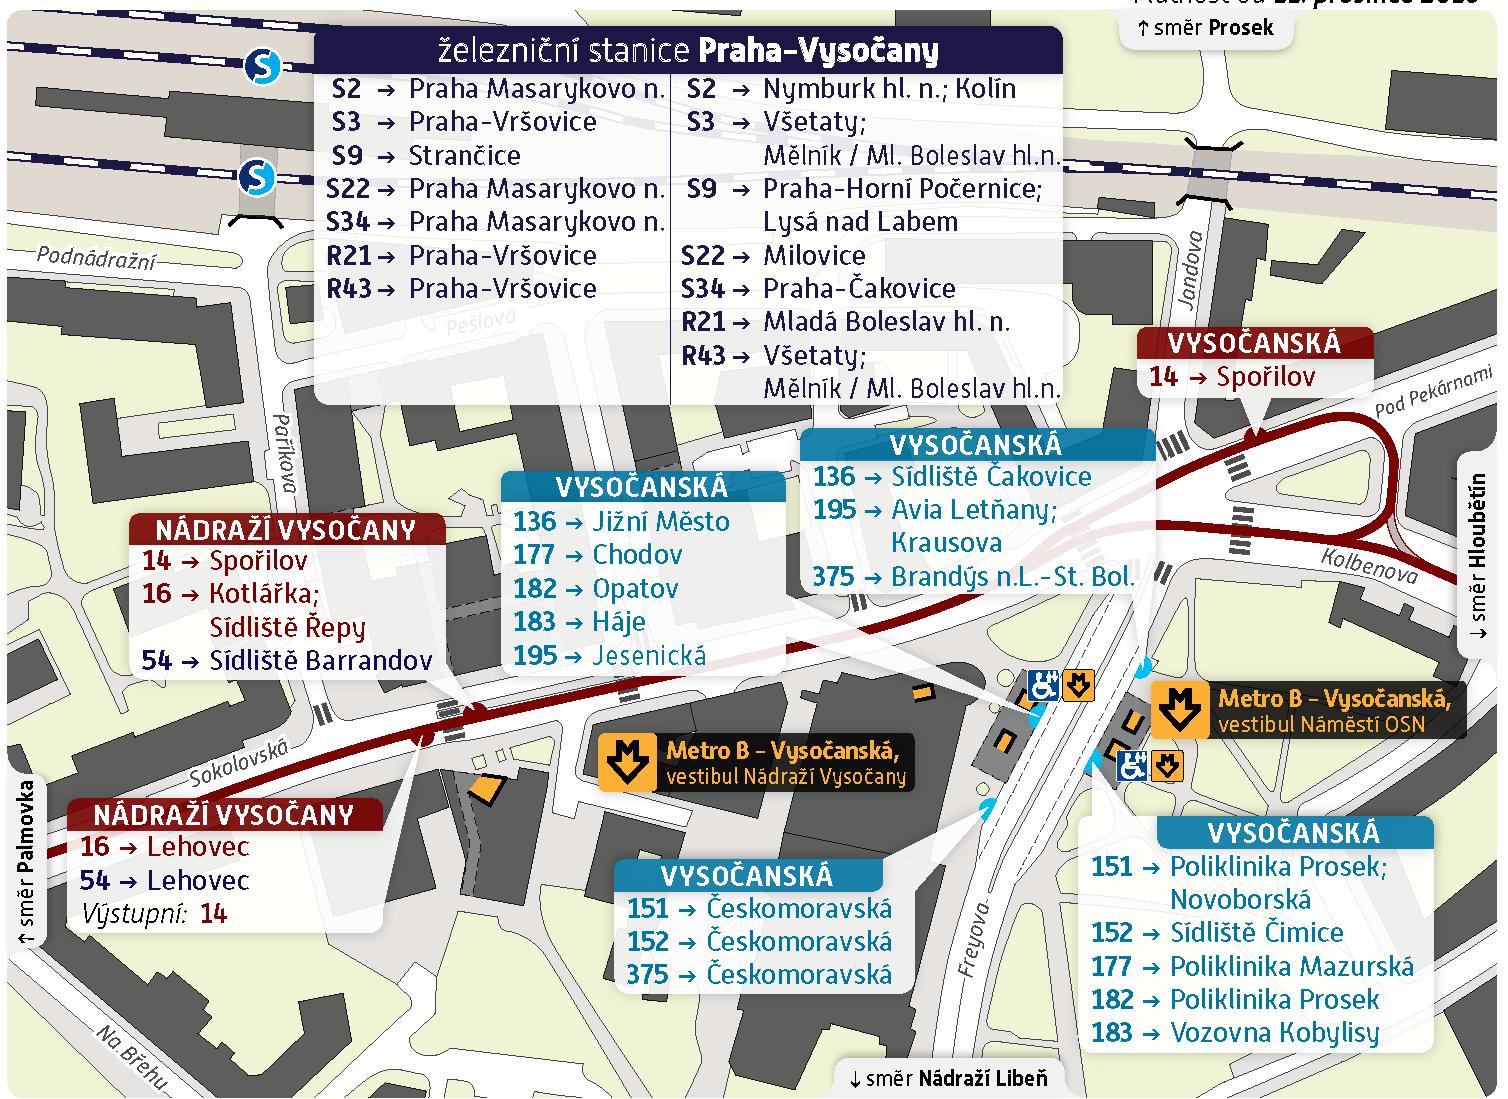 Станция метро Vysočanská